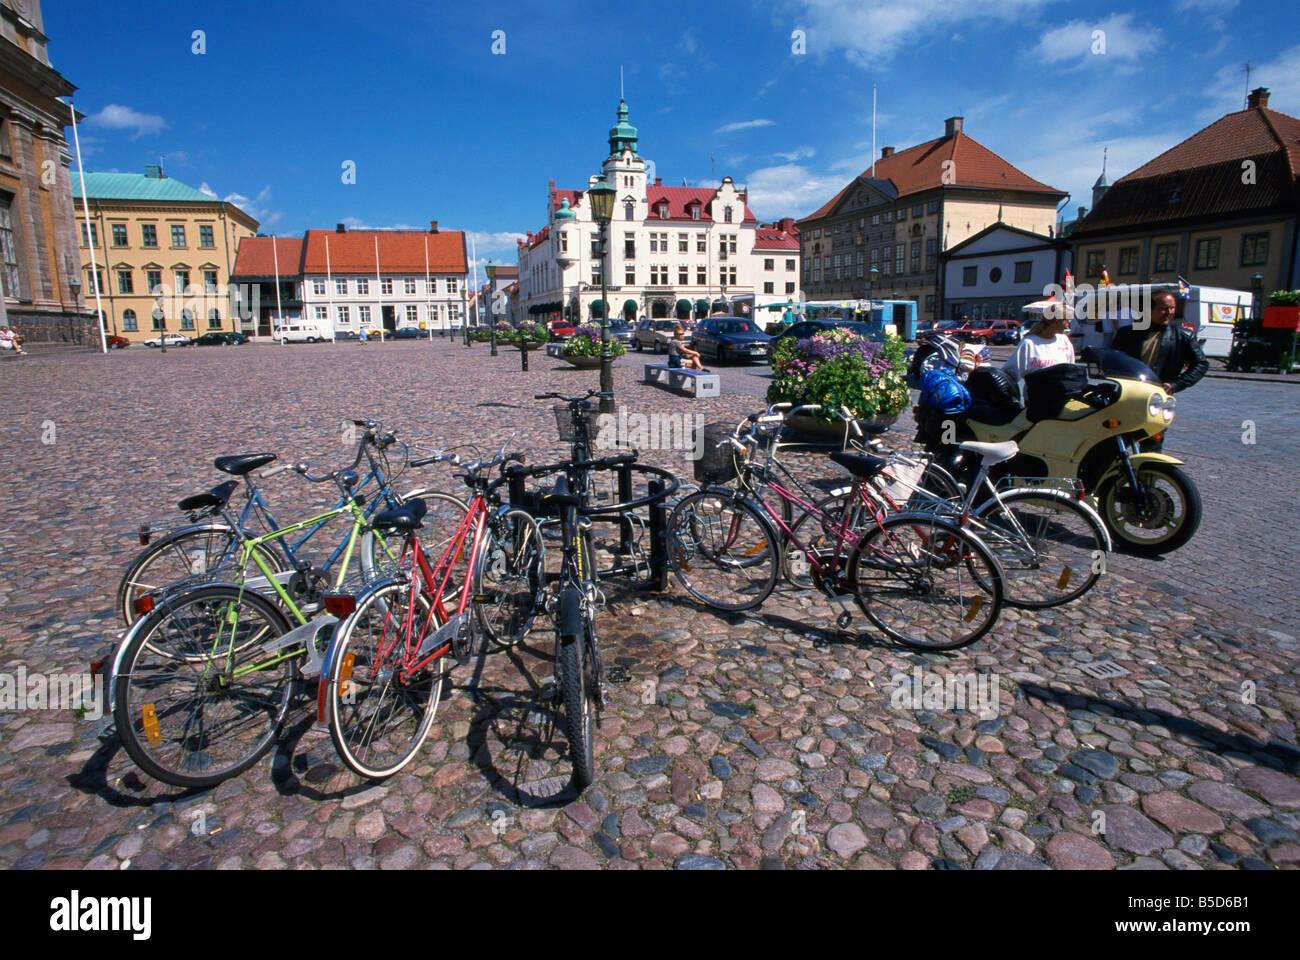 Stortorget Kalmar Smaland Sweden Scandinavia Europe - Stock Image